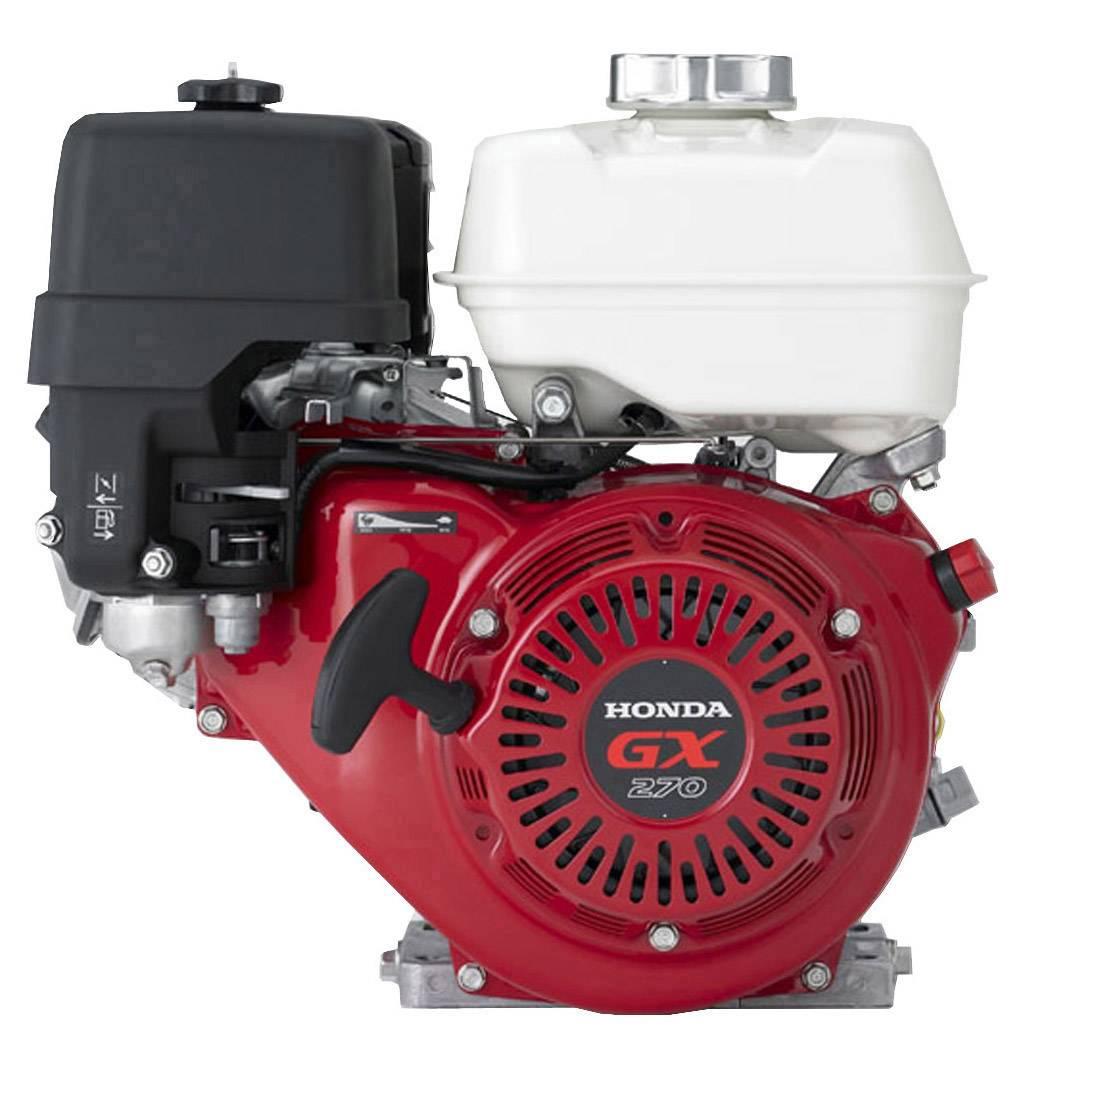 Honda GX270 Air-Cooled 4-Stroke OHV Engine